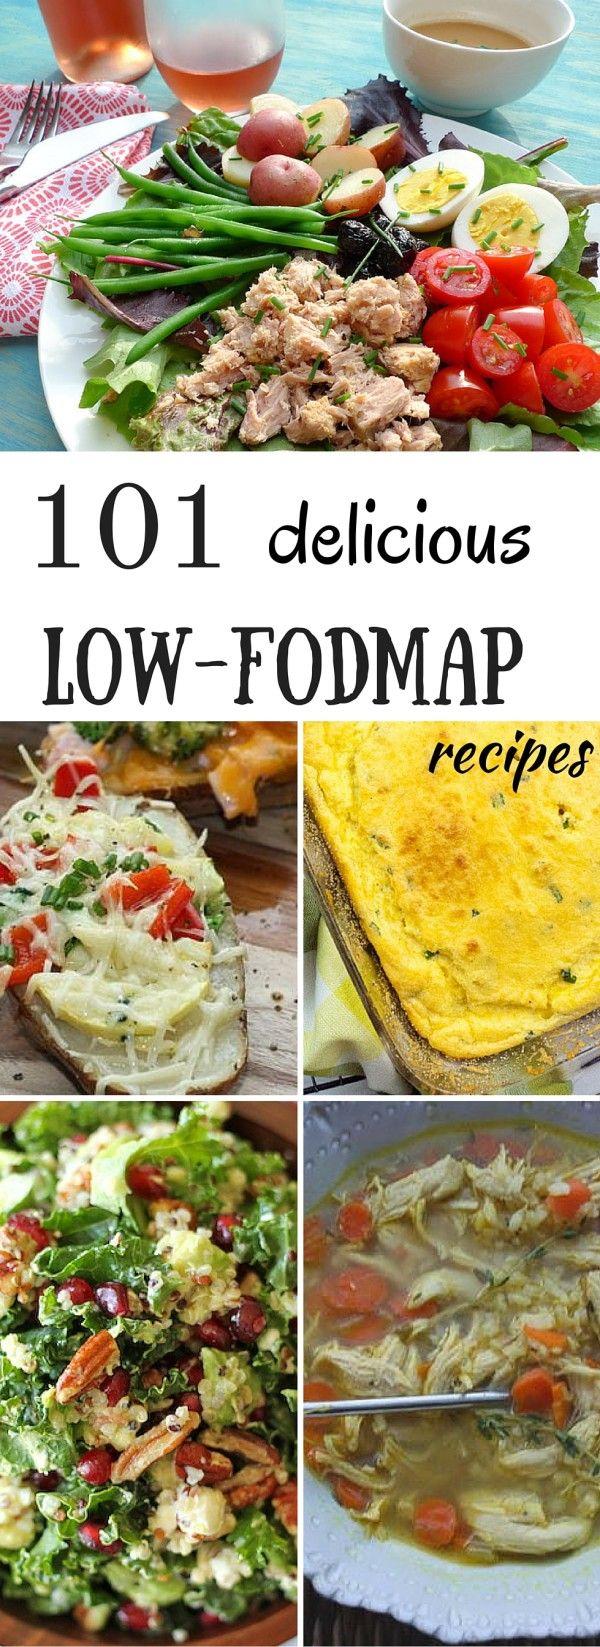 100+ Diverticulitis Recipes on Pinterest | High fiber foods, High fiber vegetables and High ...